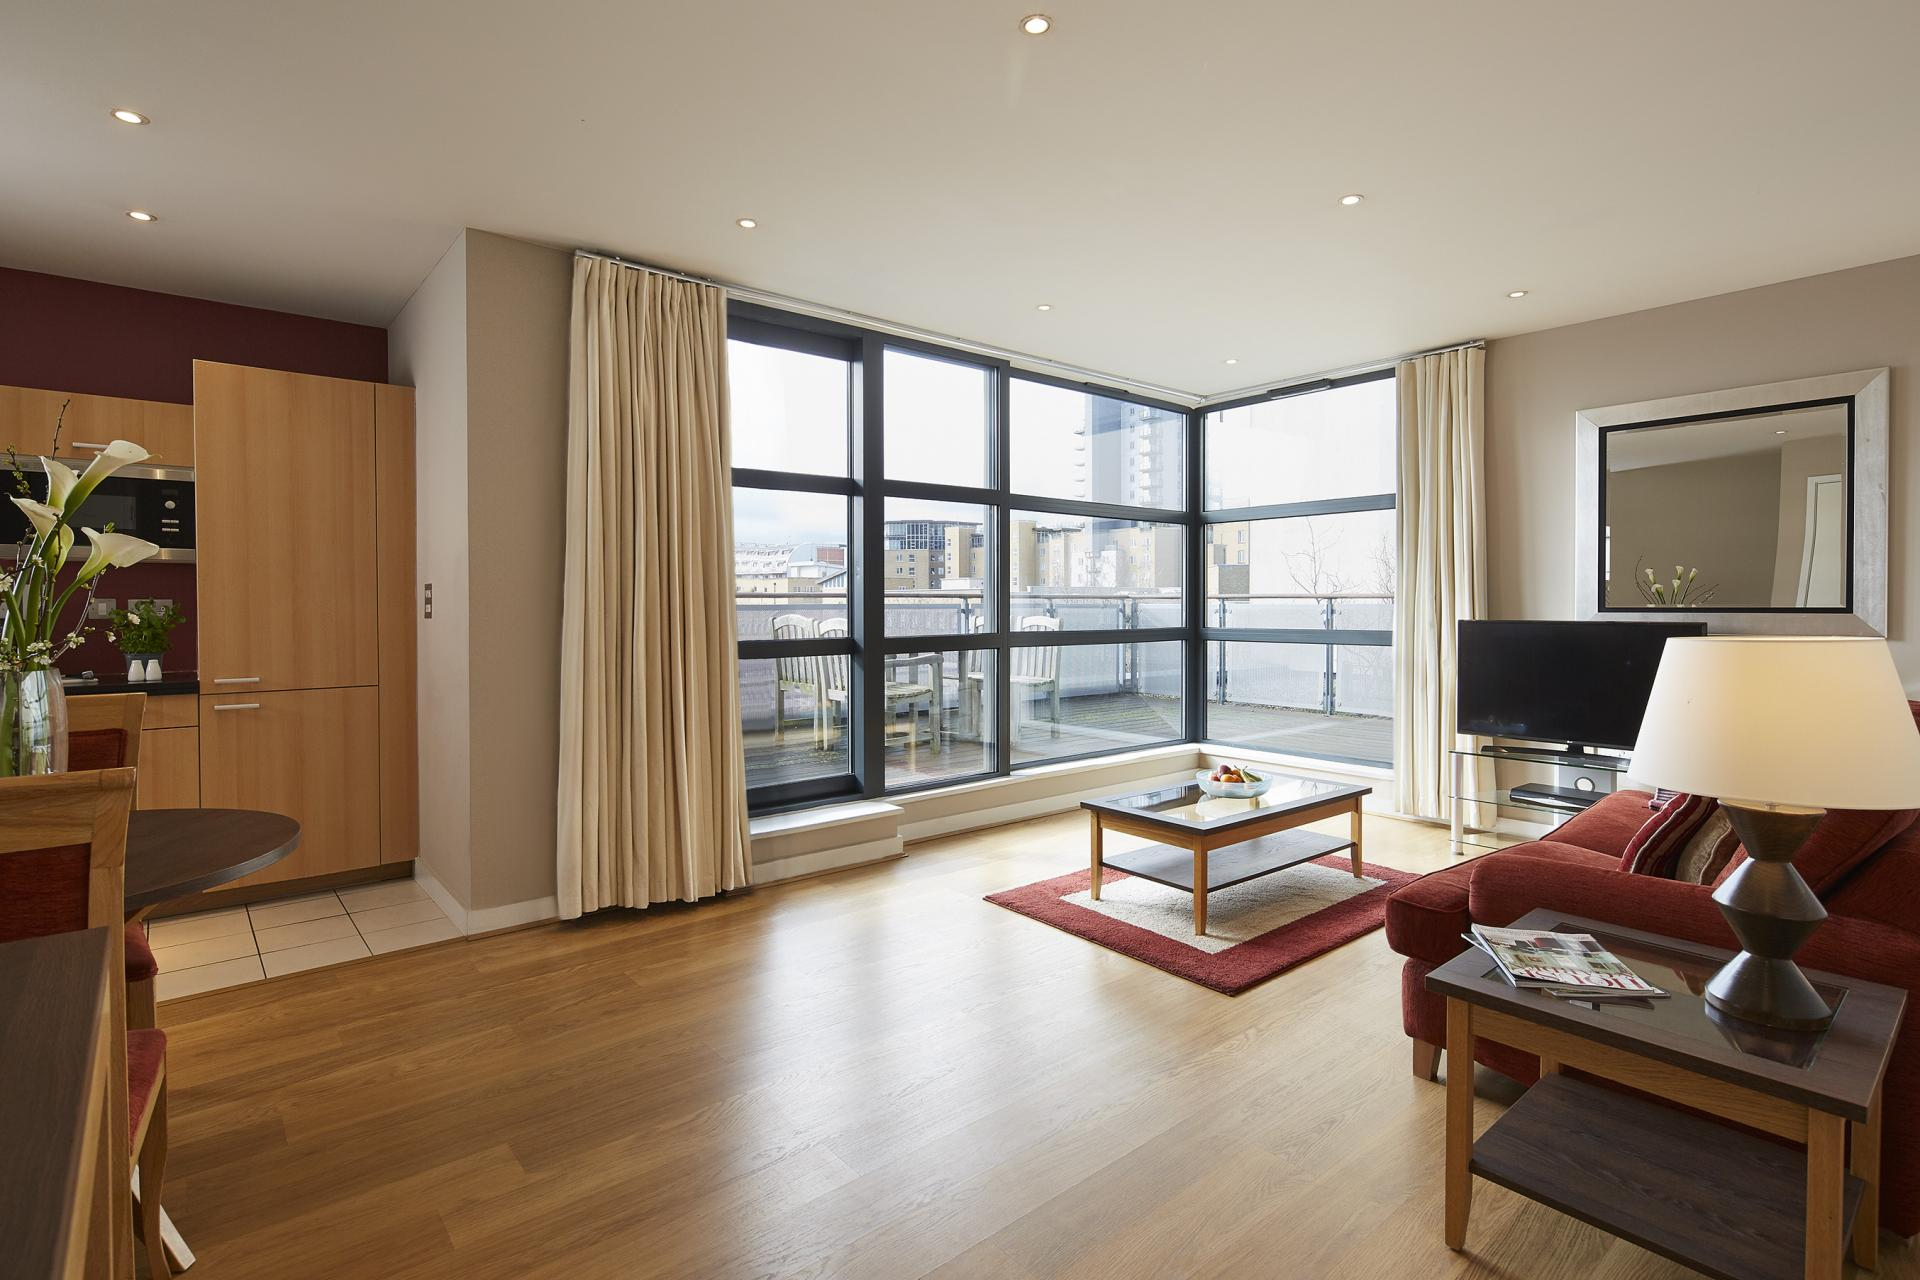 Windows at Marlin Canary Wharf Apartments, Canary Wharf, London